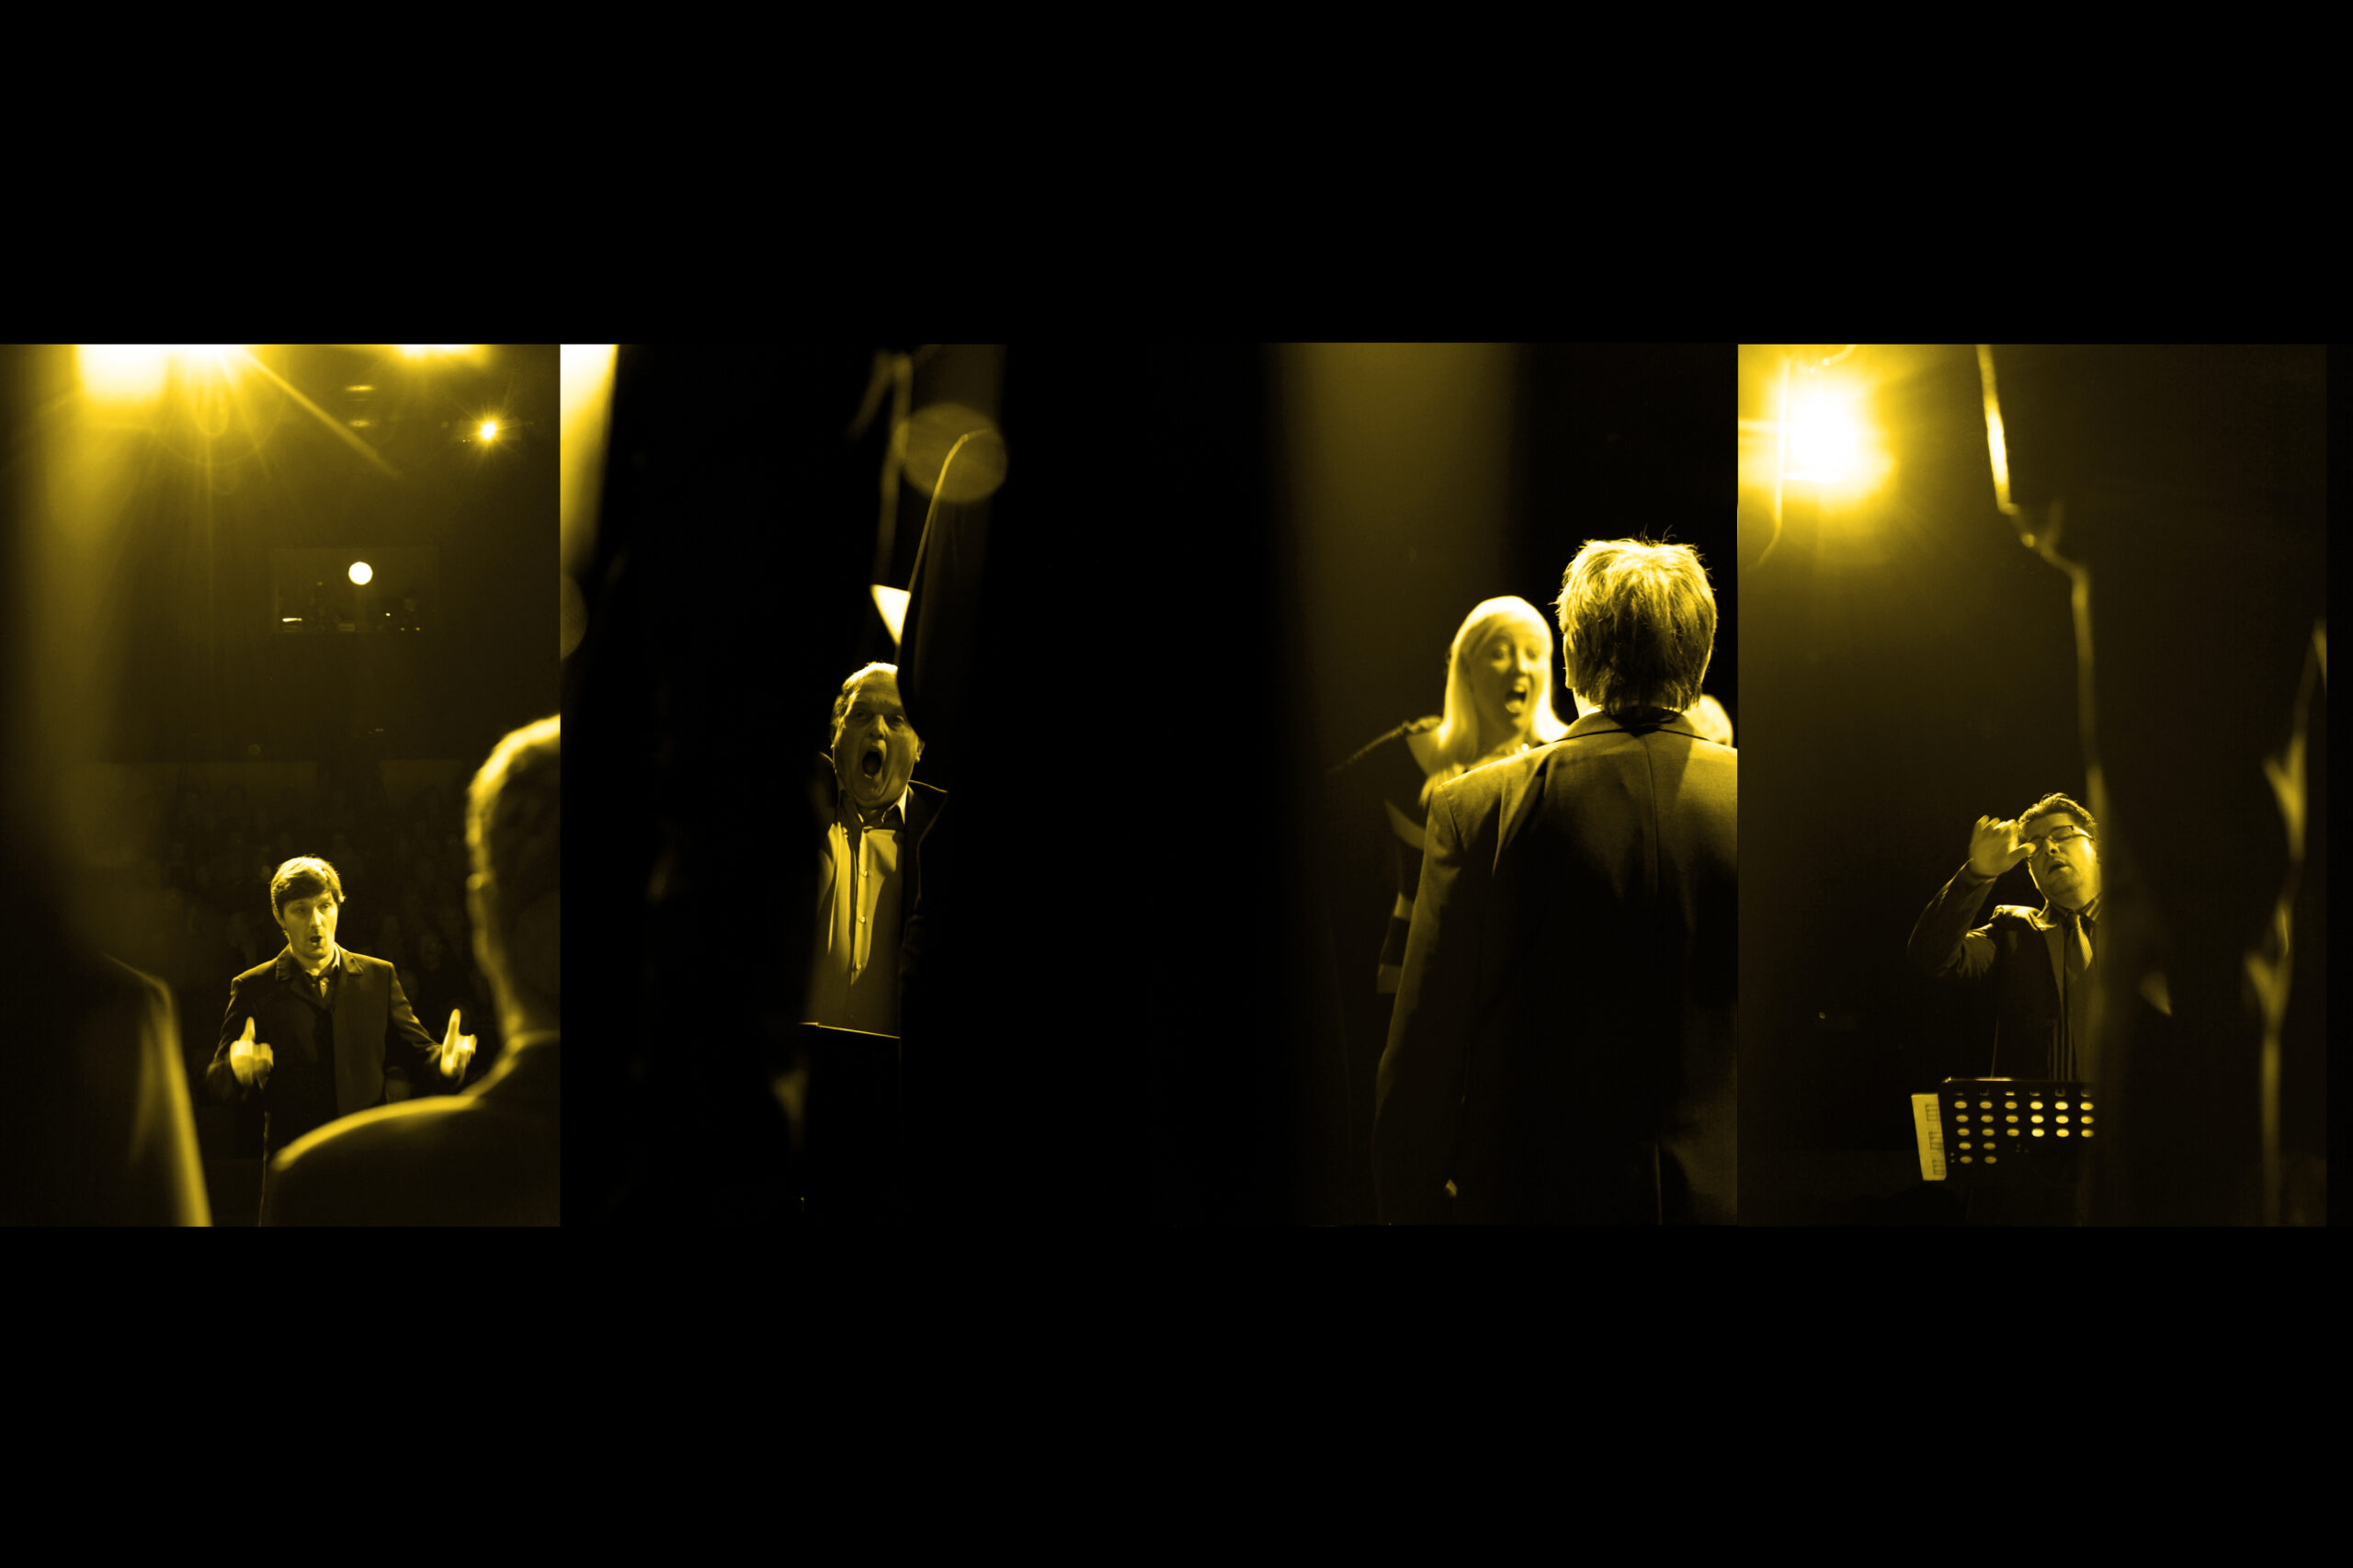 Jernej Skrt, Slovenia: Deep Yellow, 2019, Deskle Cultural Centre, Slovenia - Conductors Andrej Filipič, Miran Rustja, Katja Bajec Mihelj and Matej Petejan, all coming from Primorska, are directing their choirs at the Choral review of the Gorizia region, 2019.